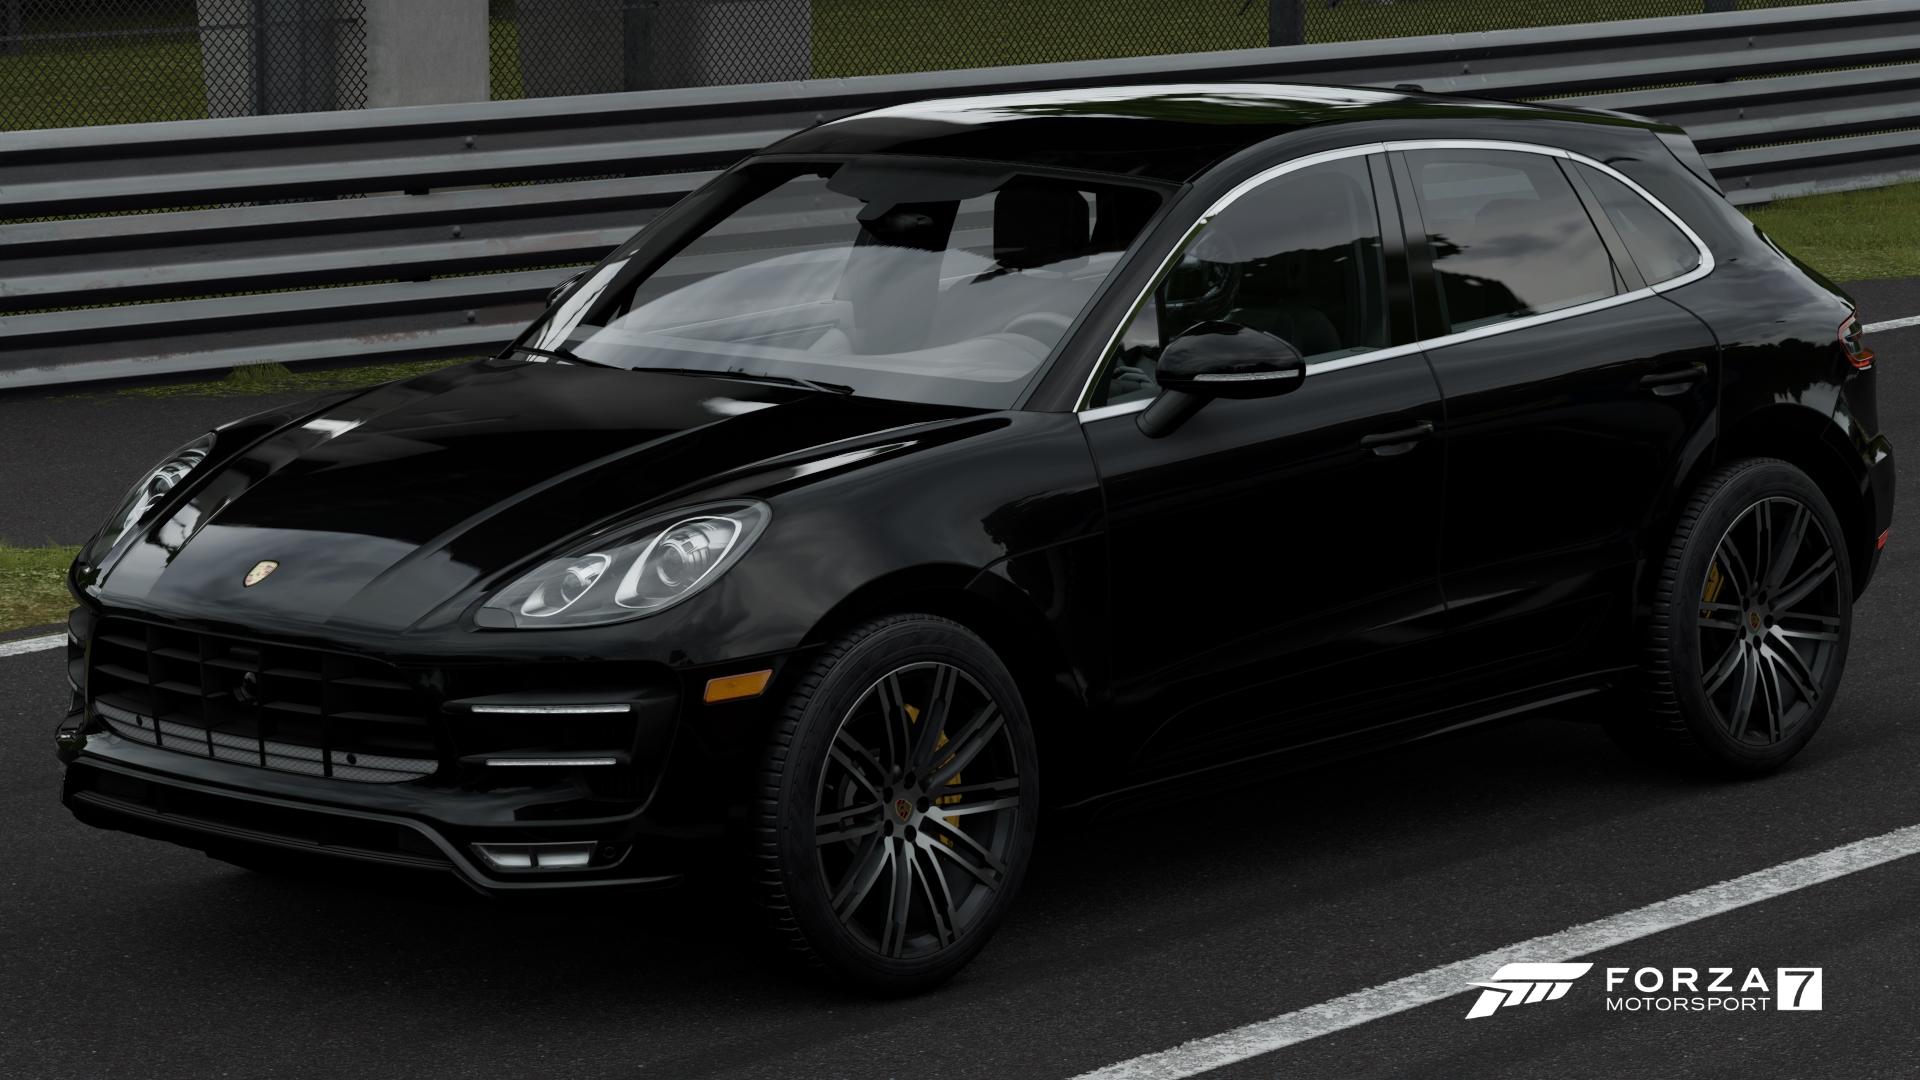 Porsche Macan Turbo | Forza Motorsport Wiki | FANDOM ...